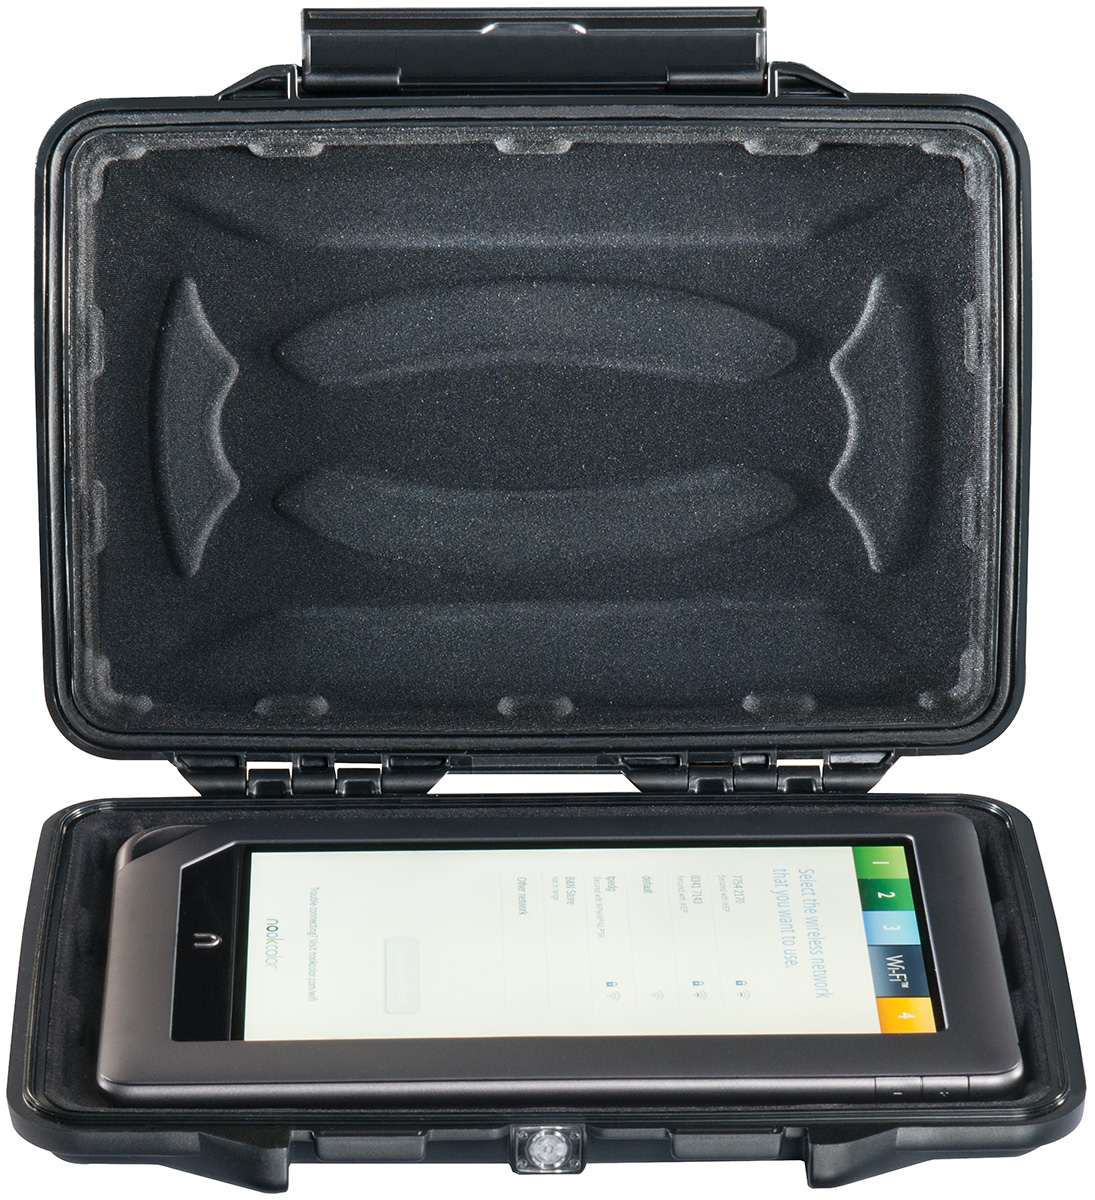 pelican peli products 1055CC hard crushproof ipad mini protection case